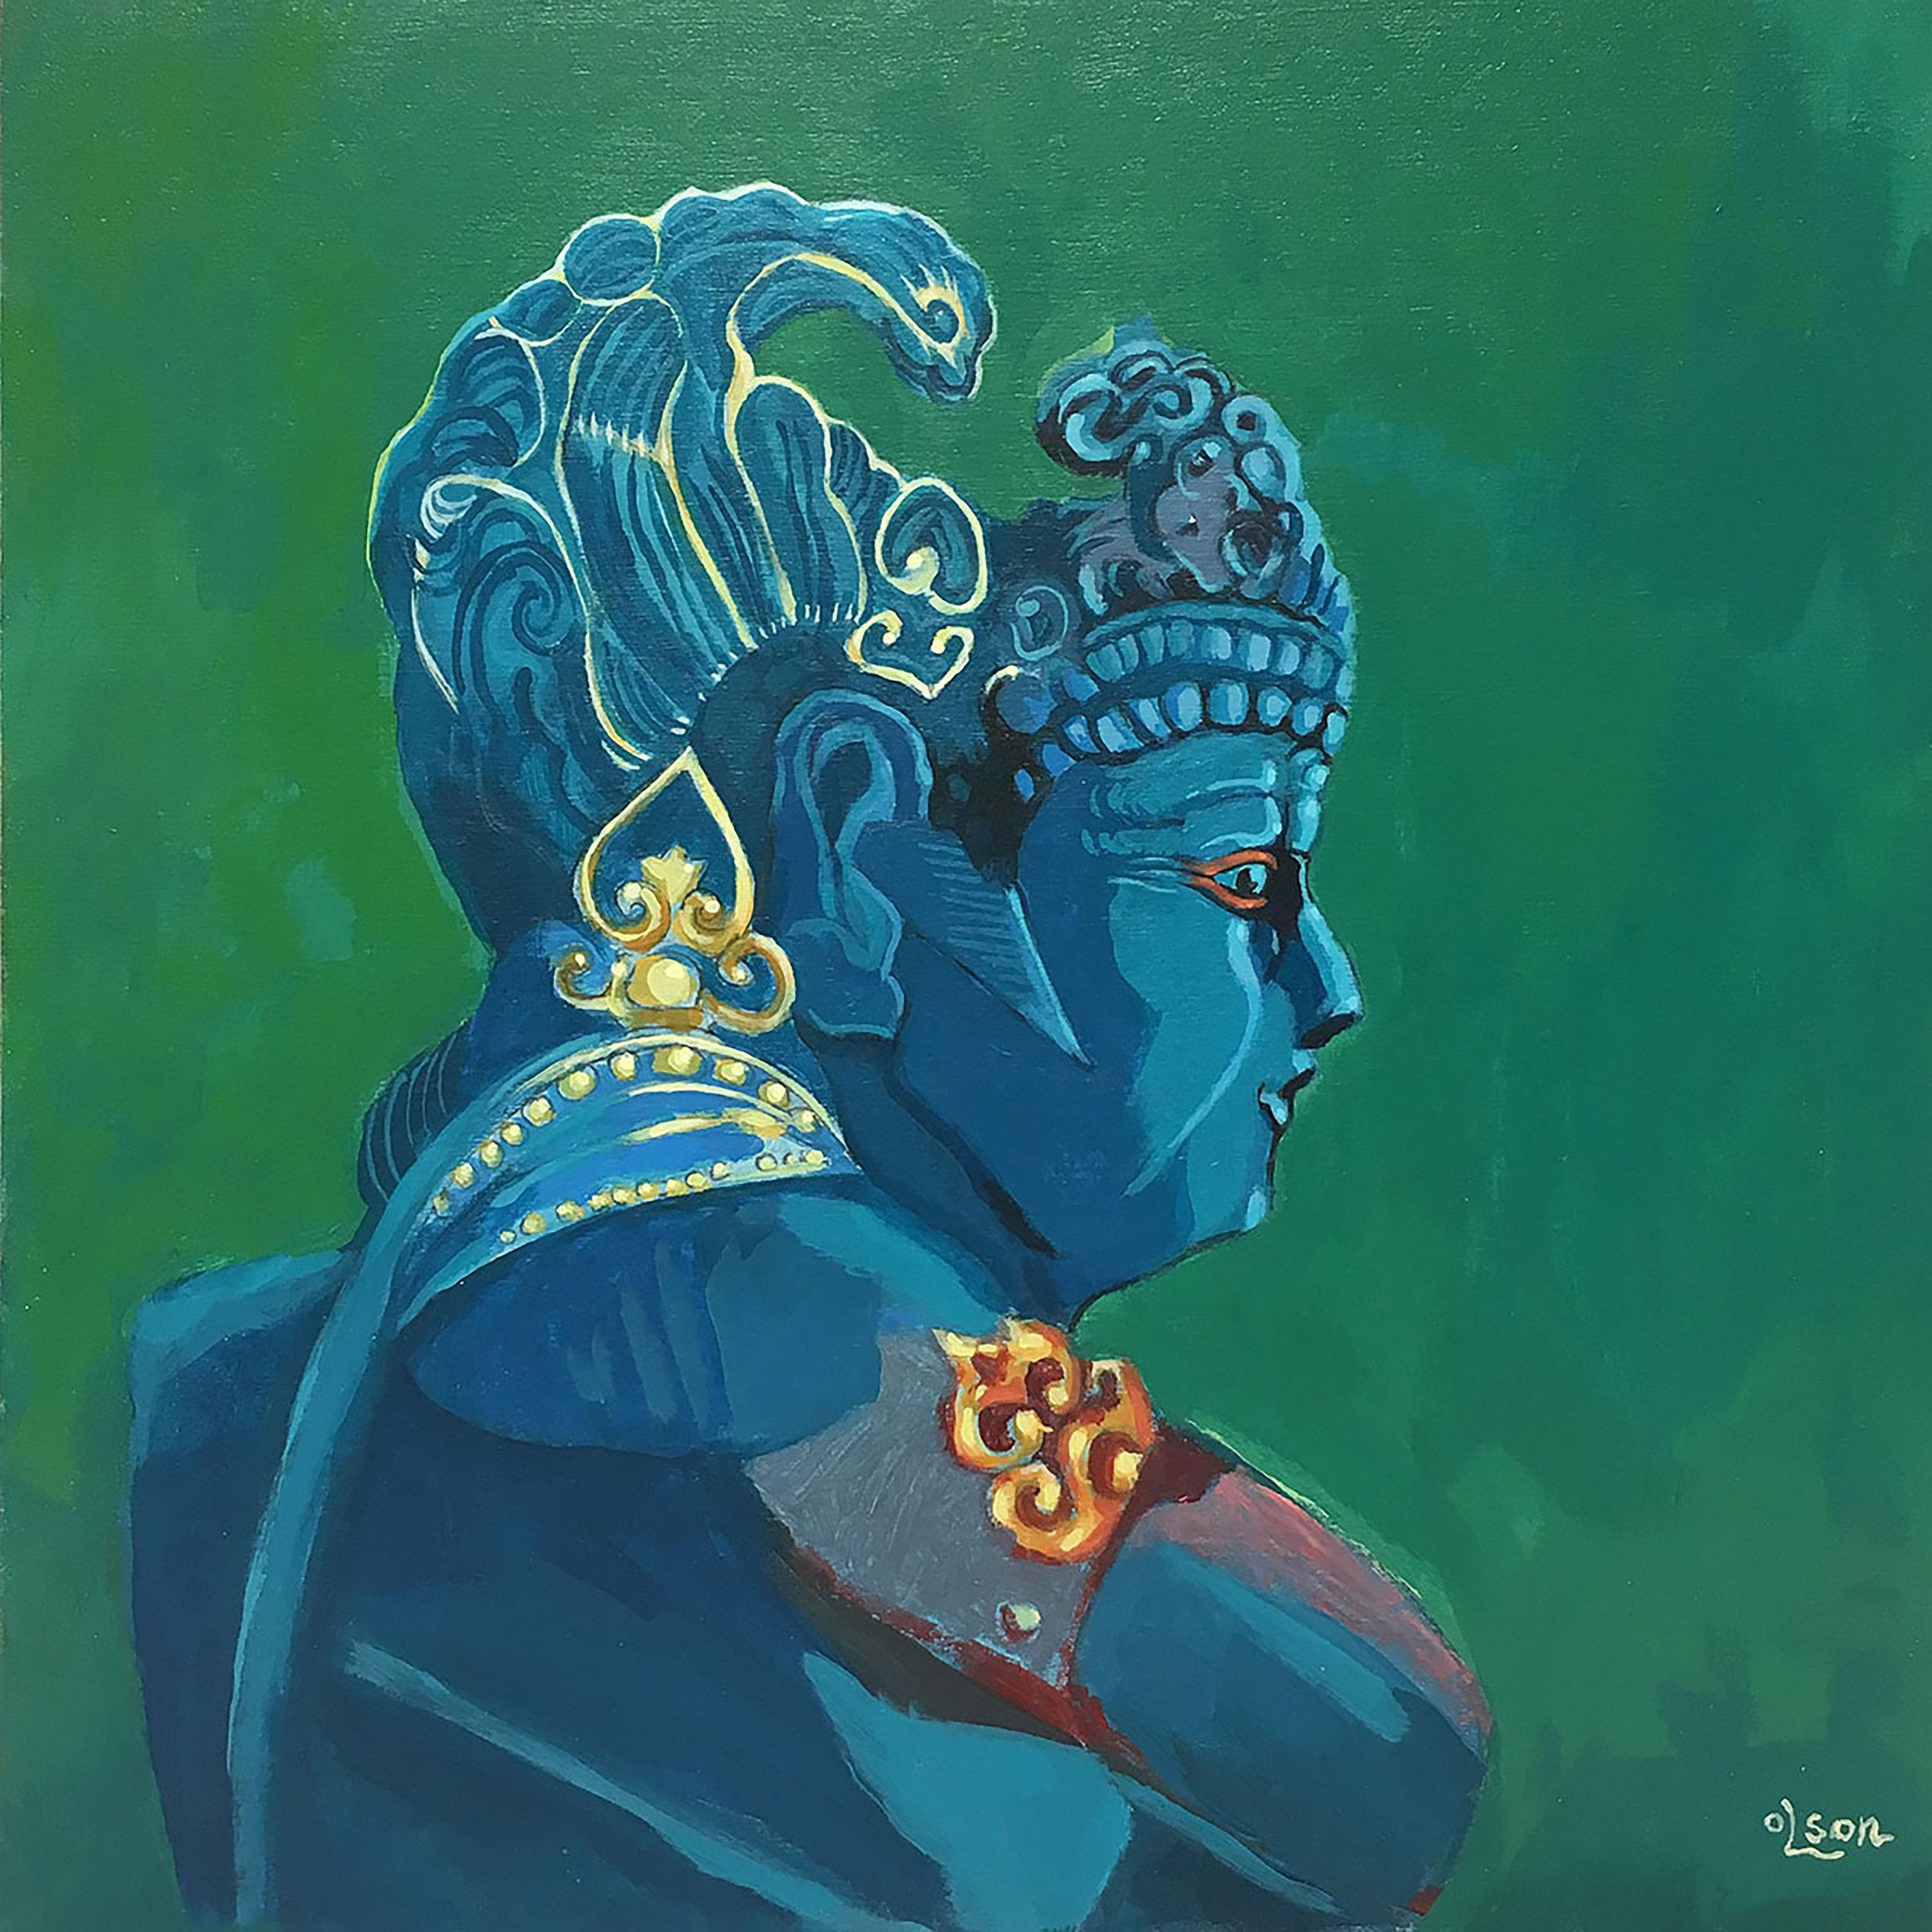 Christopher Olson-Balinese Statue-Acrylic-12x12in-2018-$1200.00.jpg